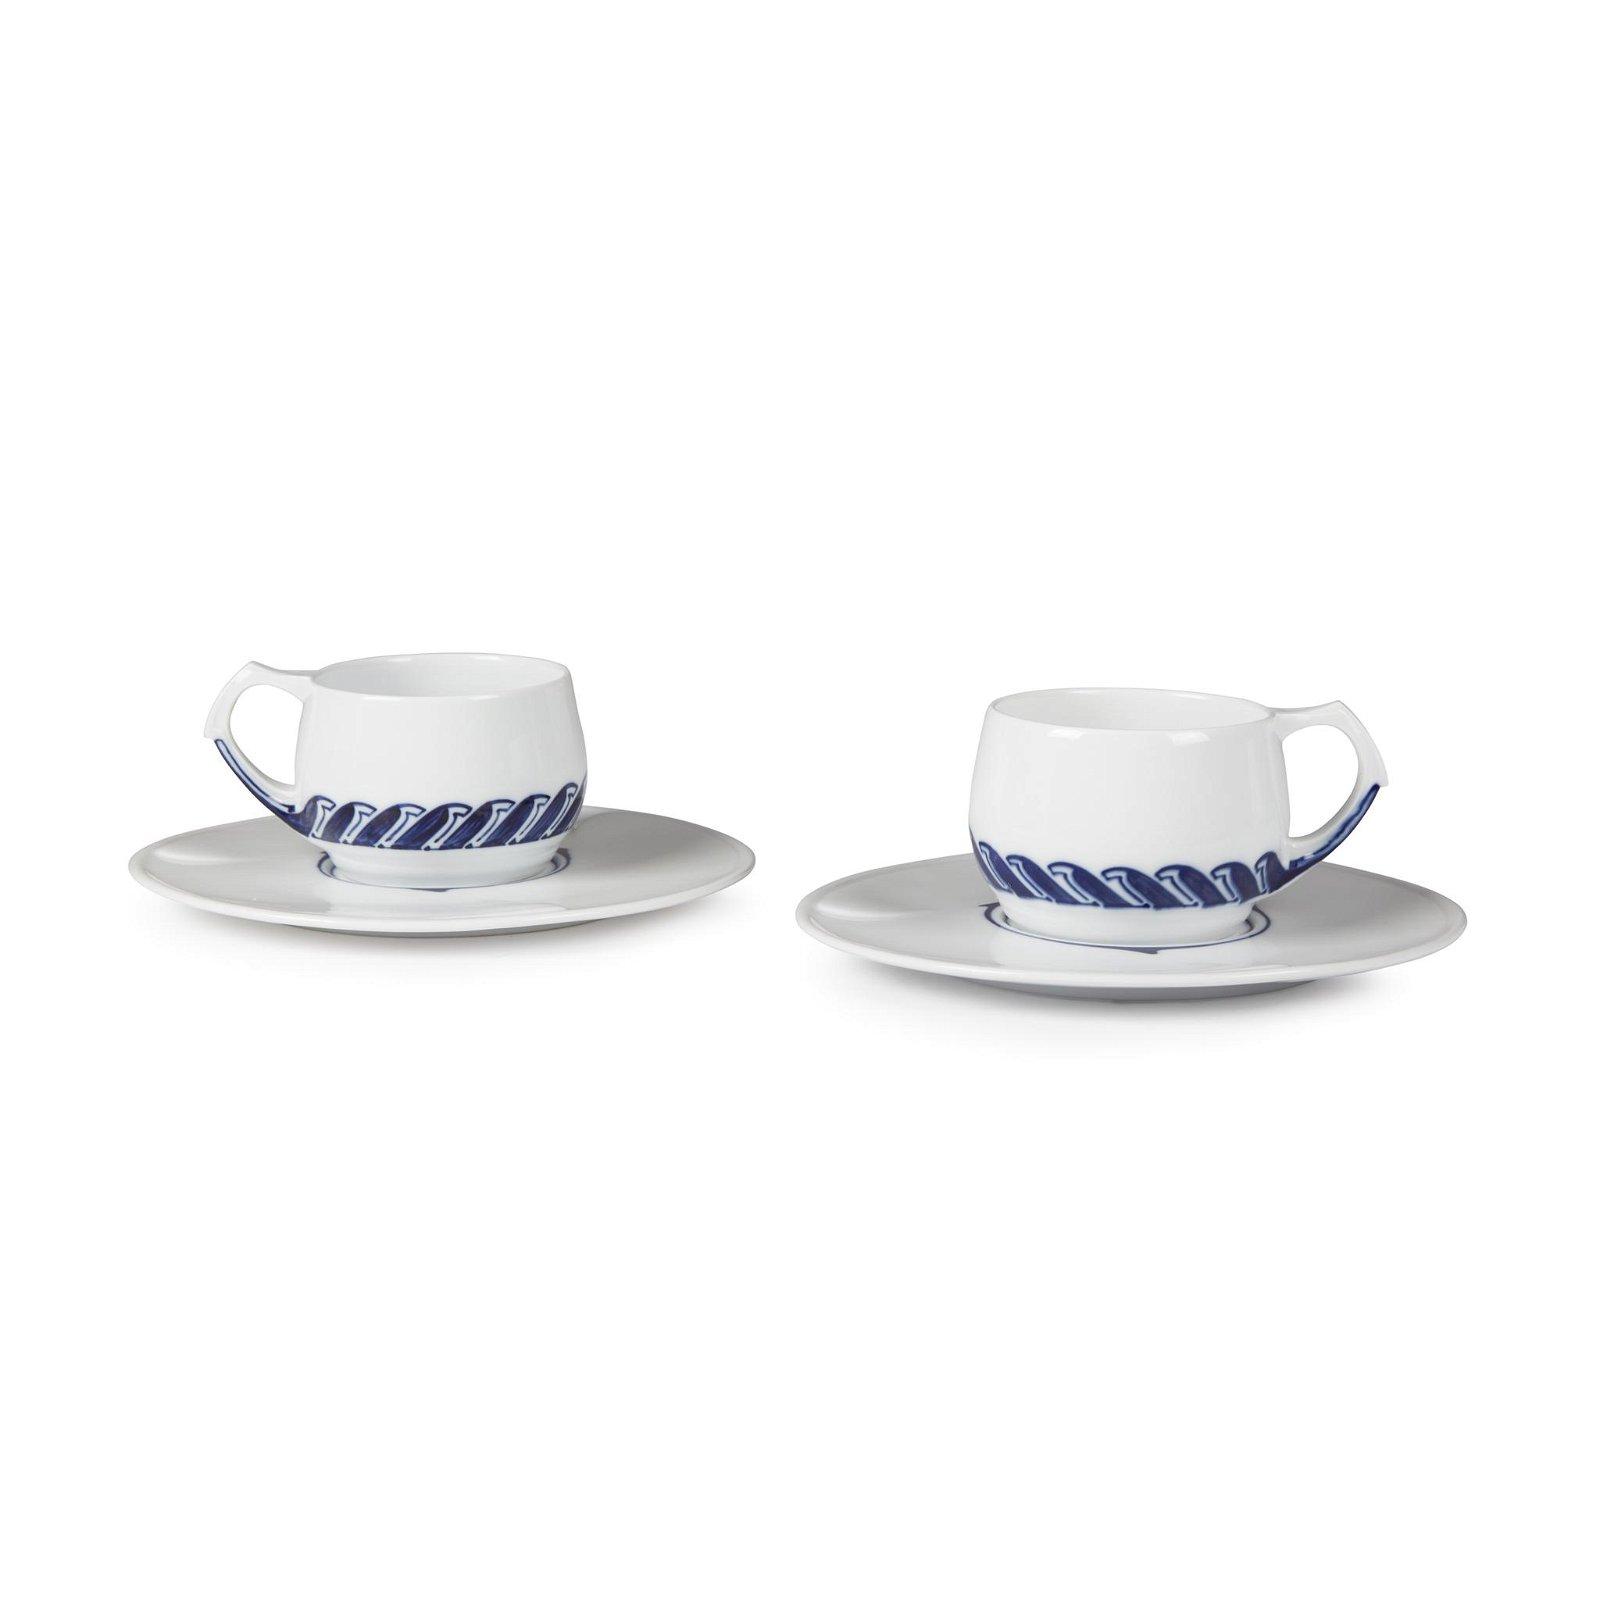 Henry van de Velde (Dutch, 1863-1957), A Pair of Coffee